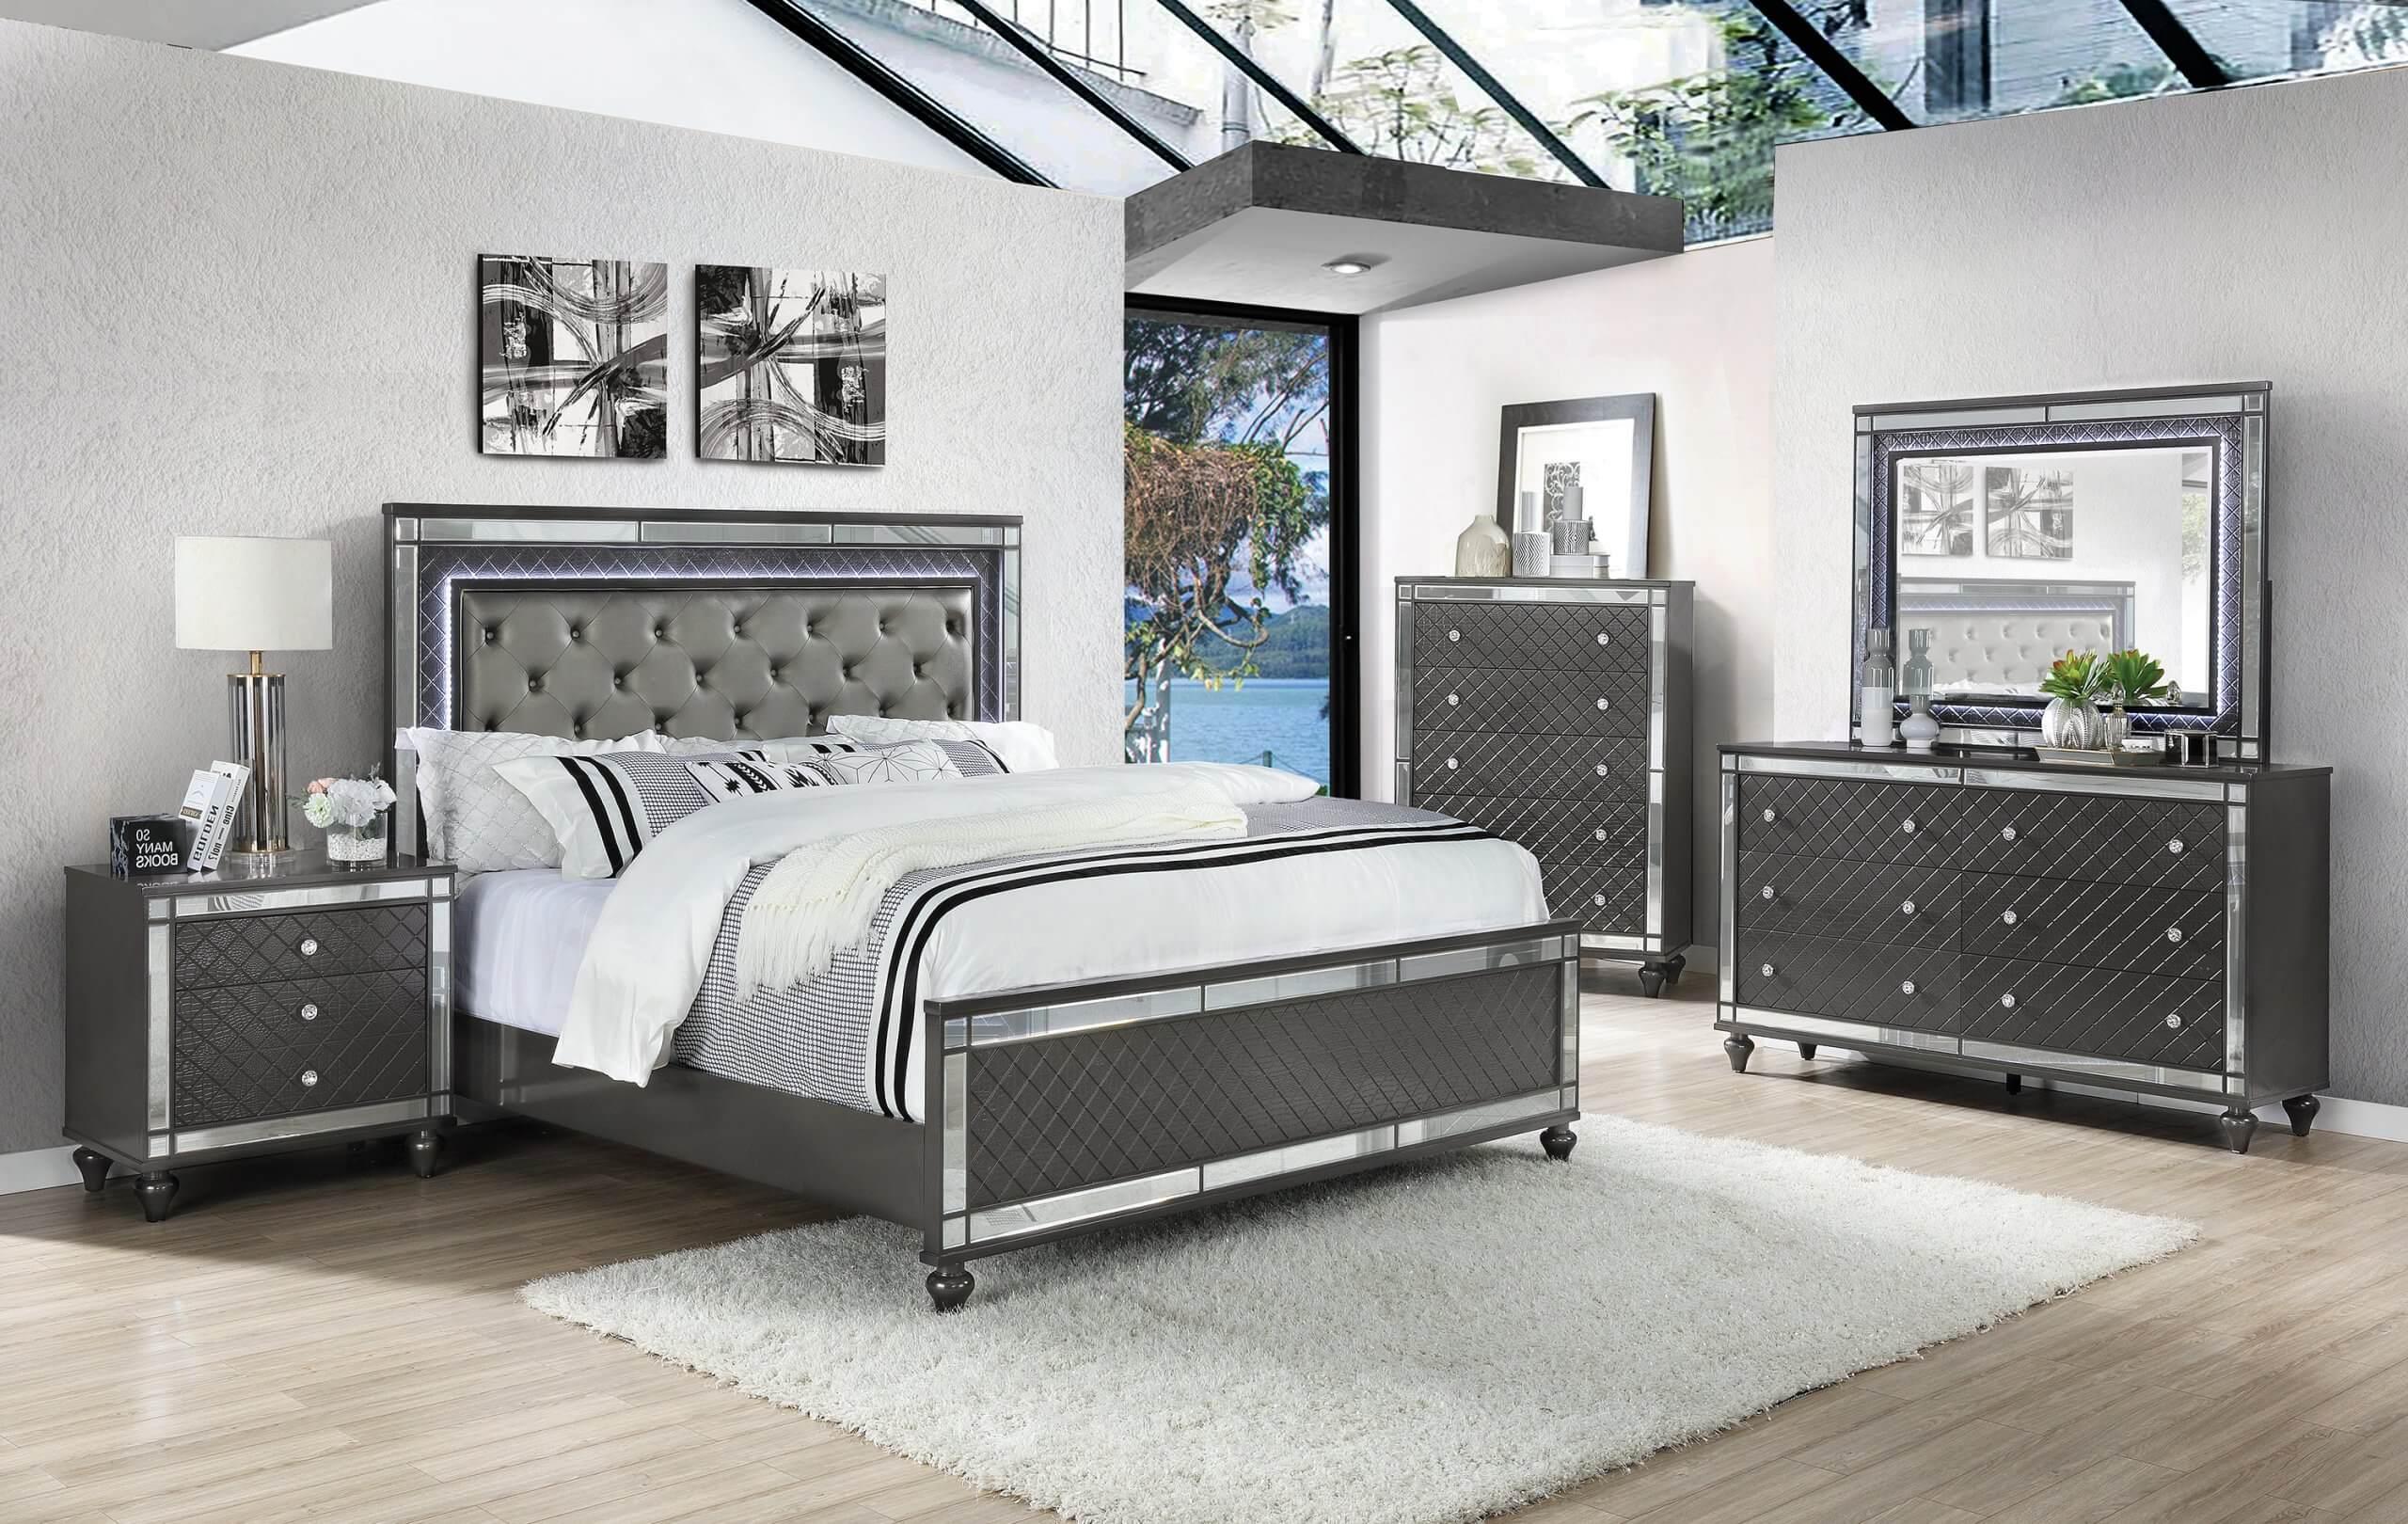 Refino Bedroom Set Urban Furniture Outlet